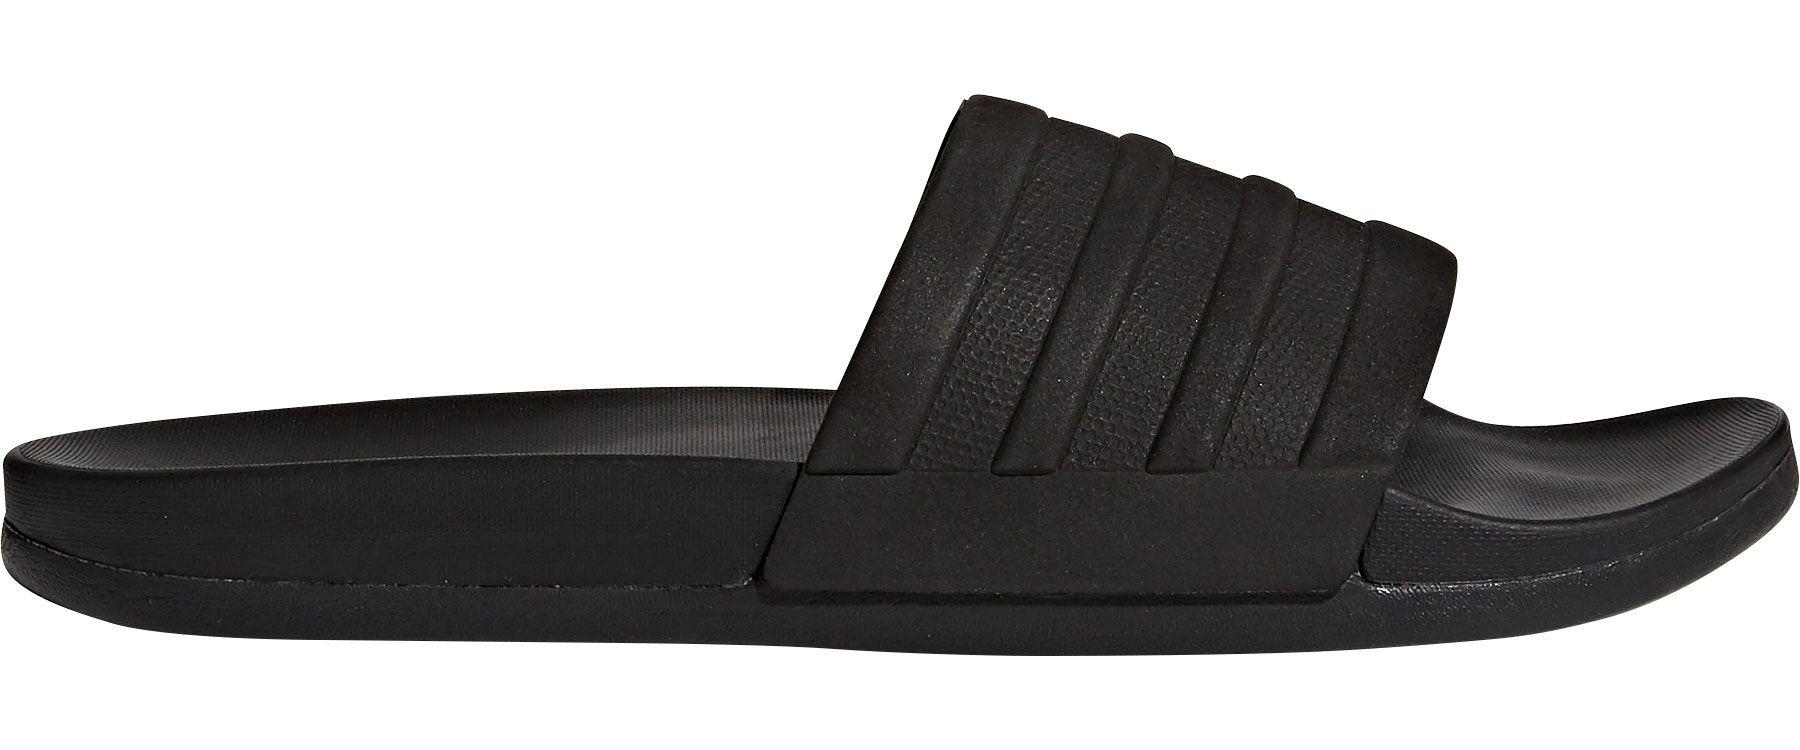 47ff722ba Lyst - adidas Adilette Cloudfoam Plus Mono Slides in Black for Men